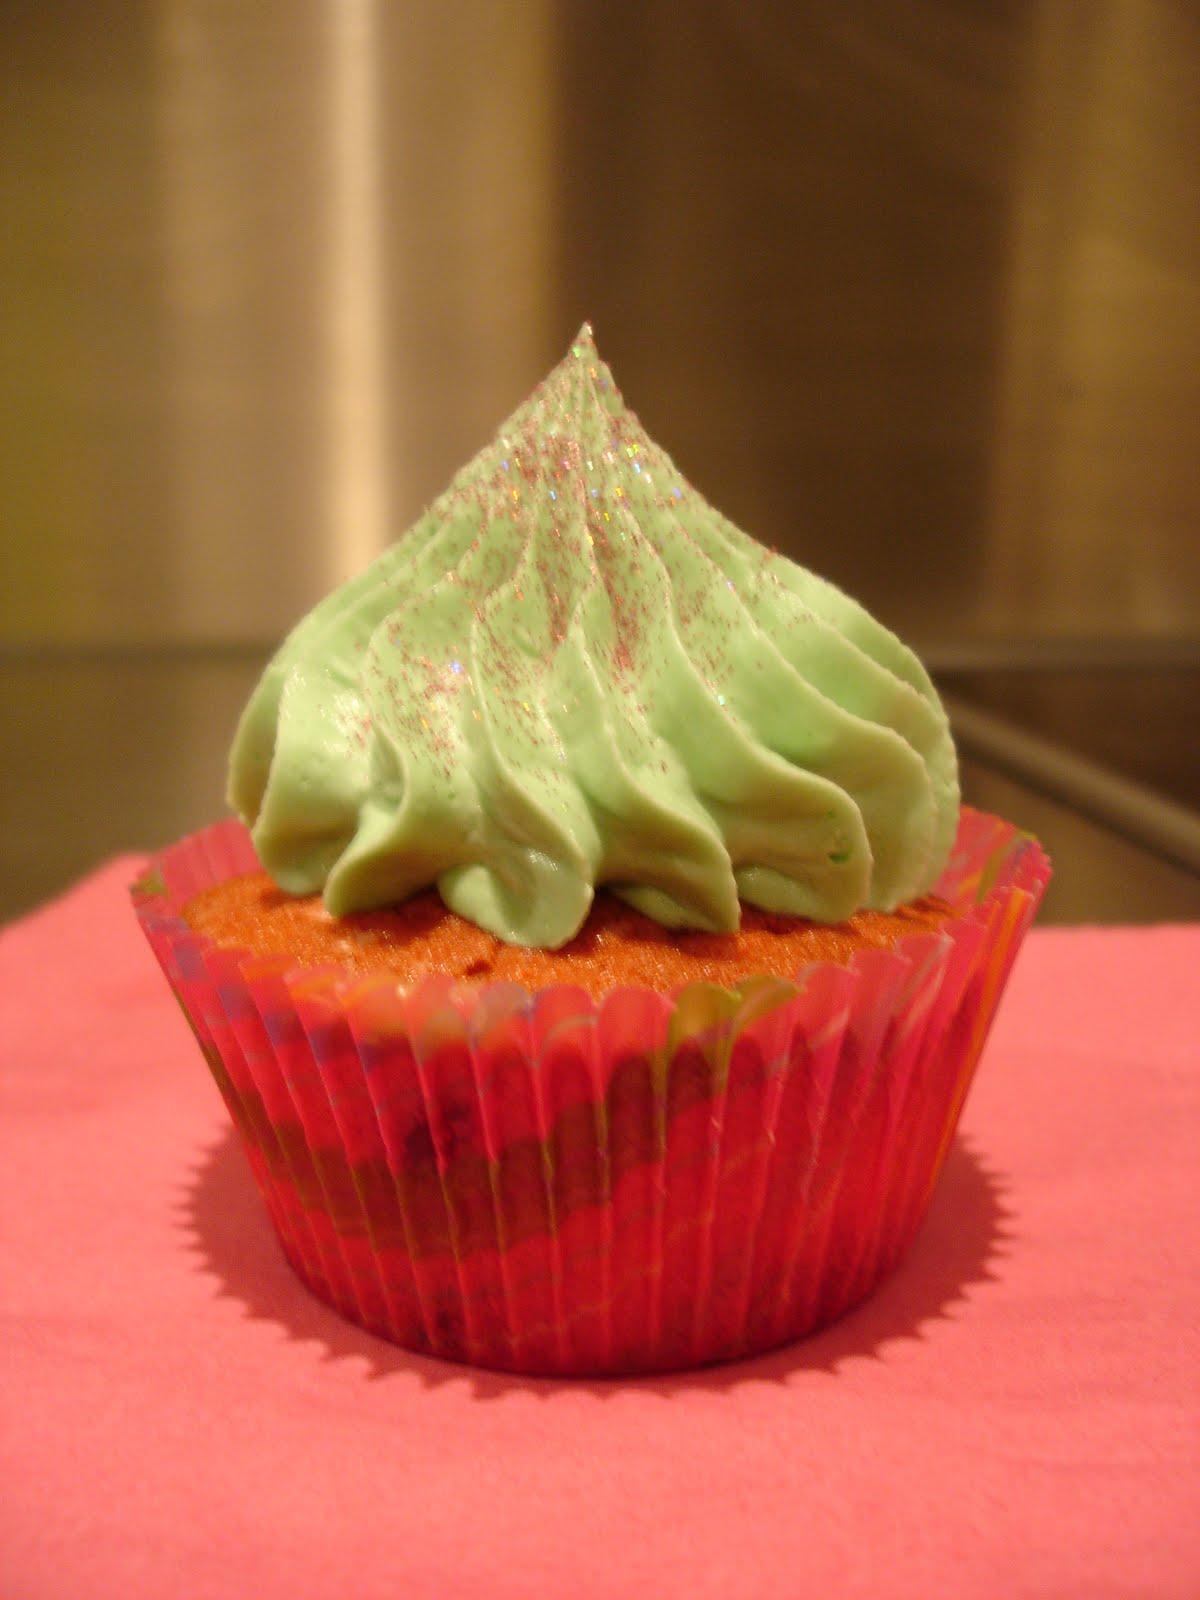 Iron Cupcake X: Watermelon Cupcakes